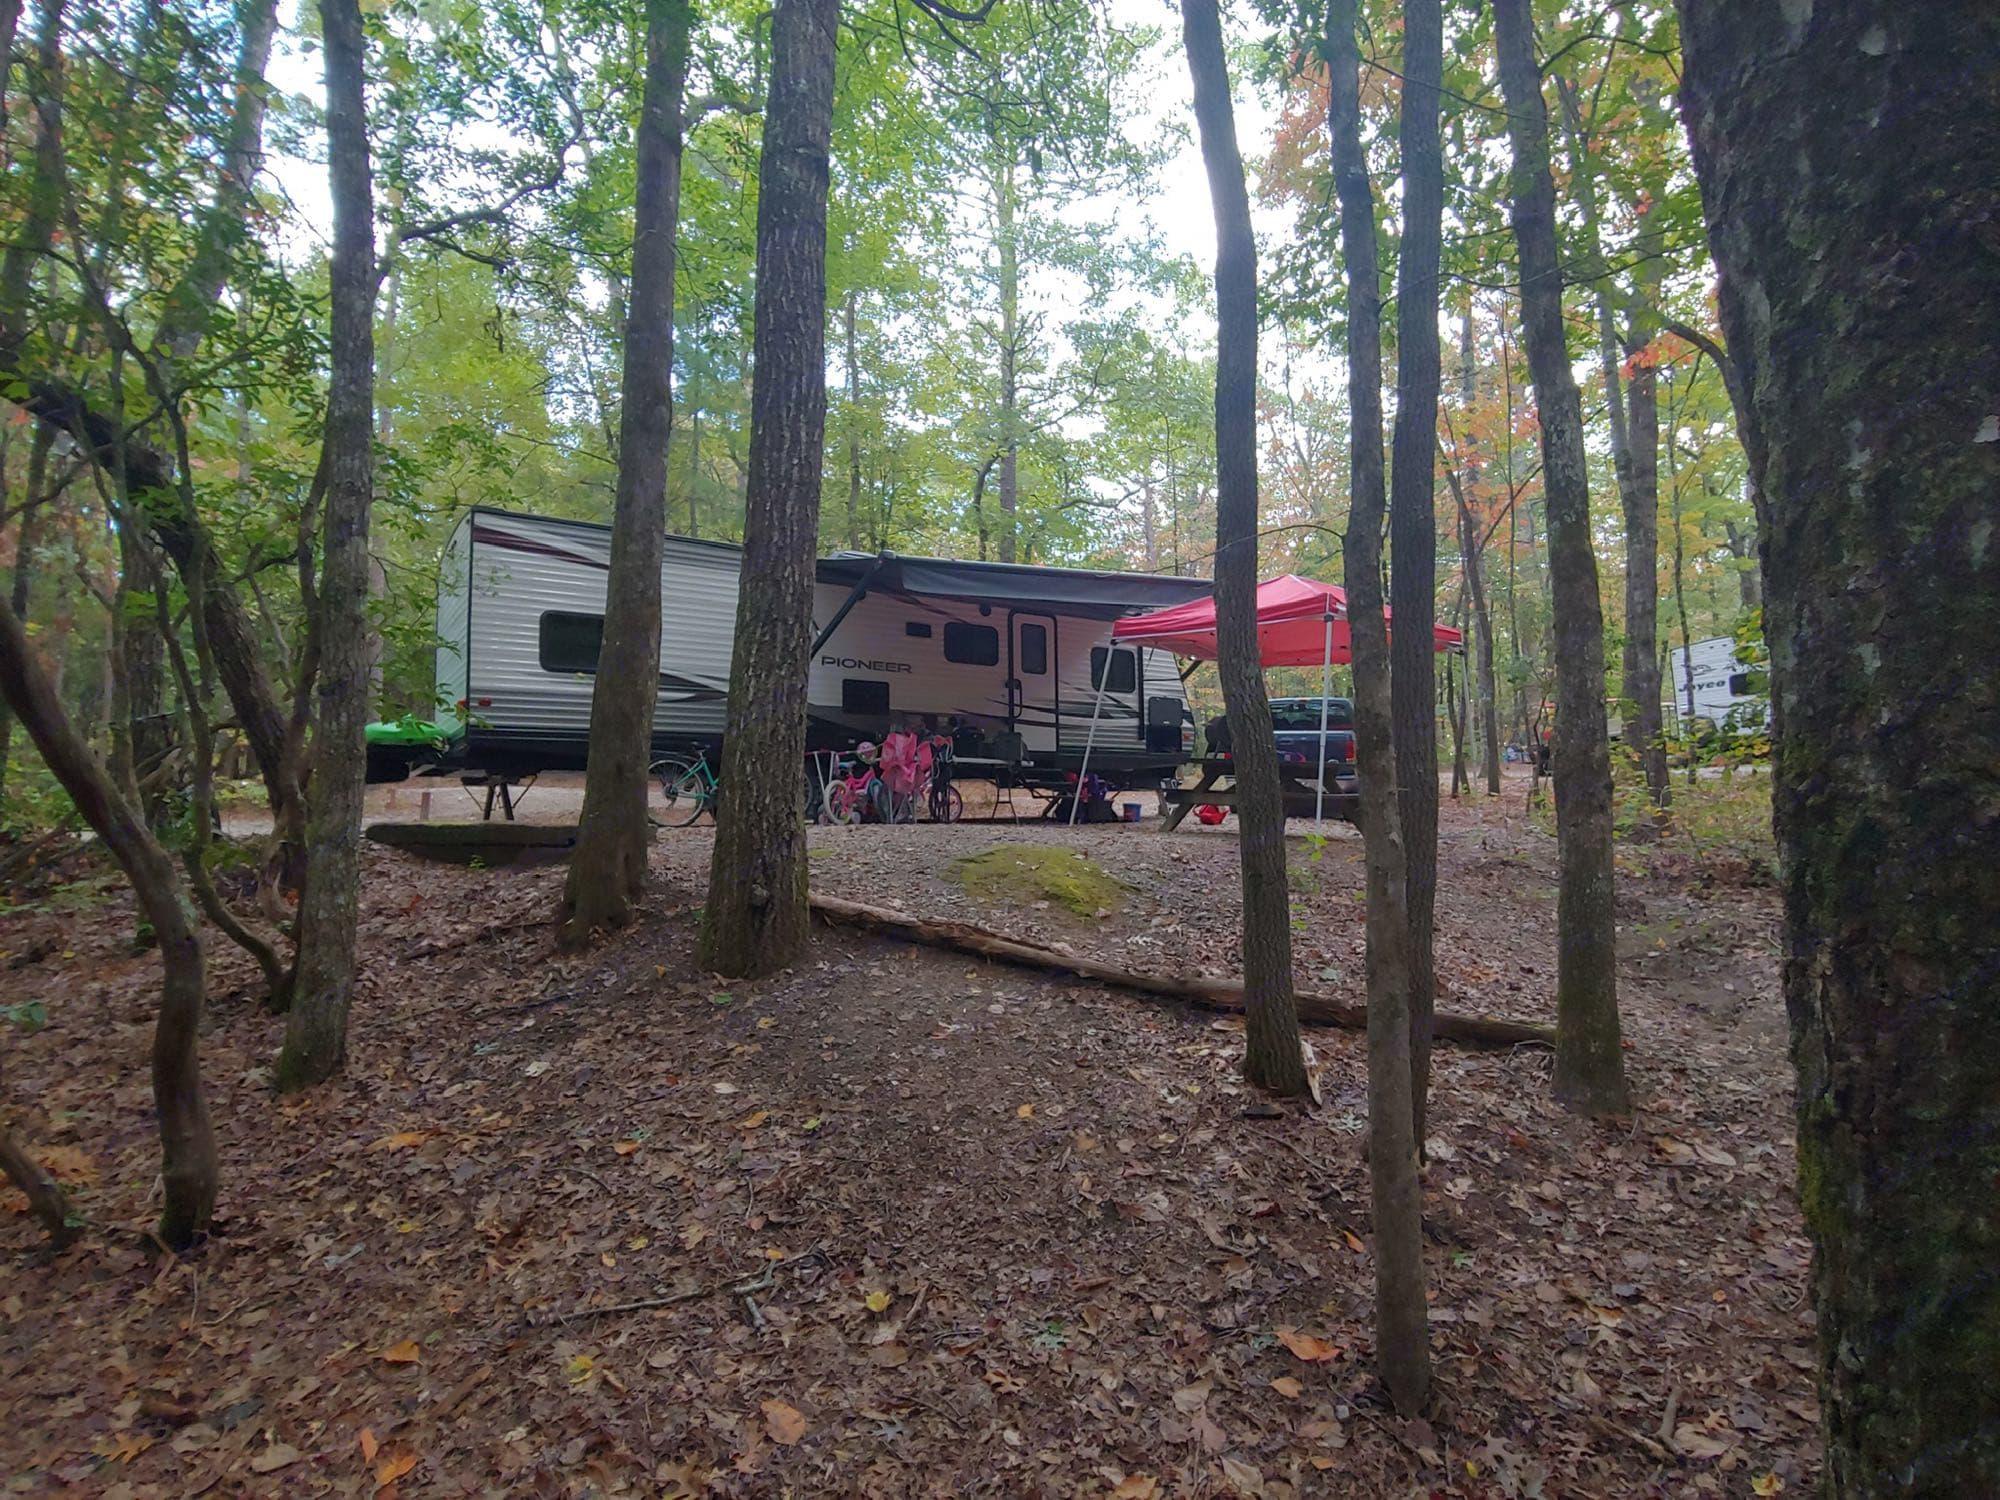 Oconee State Park in Mountain Rest, SC. Heartland Pioneer 2019